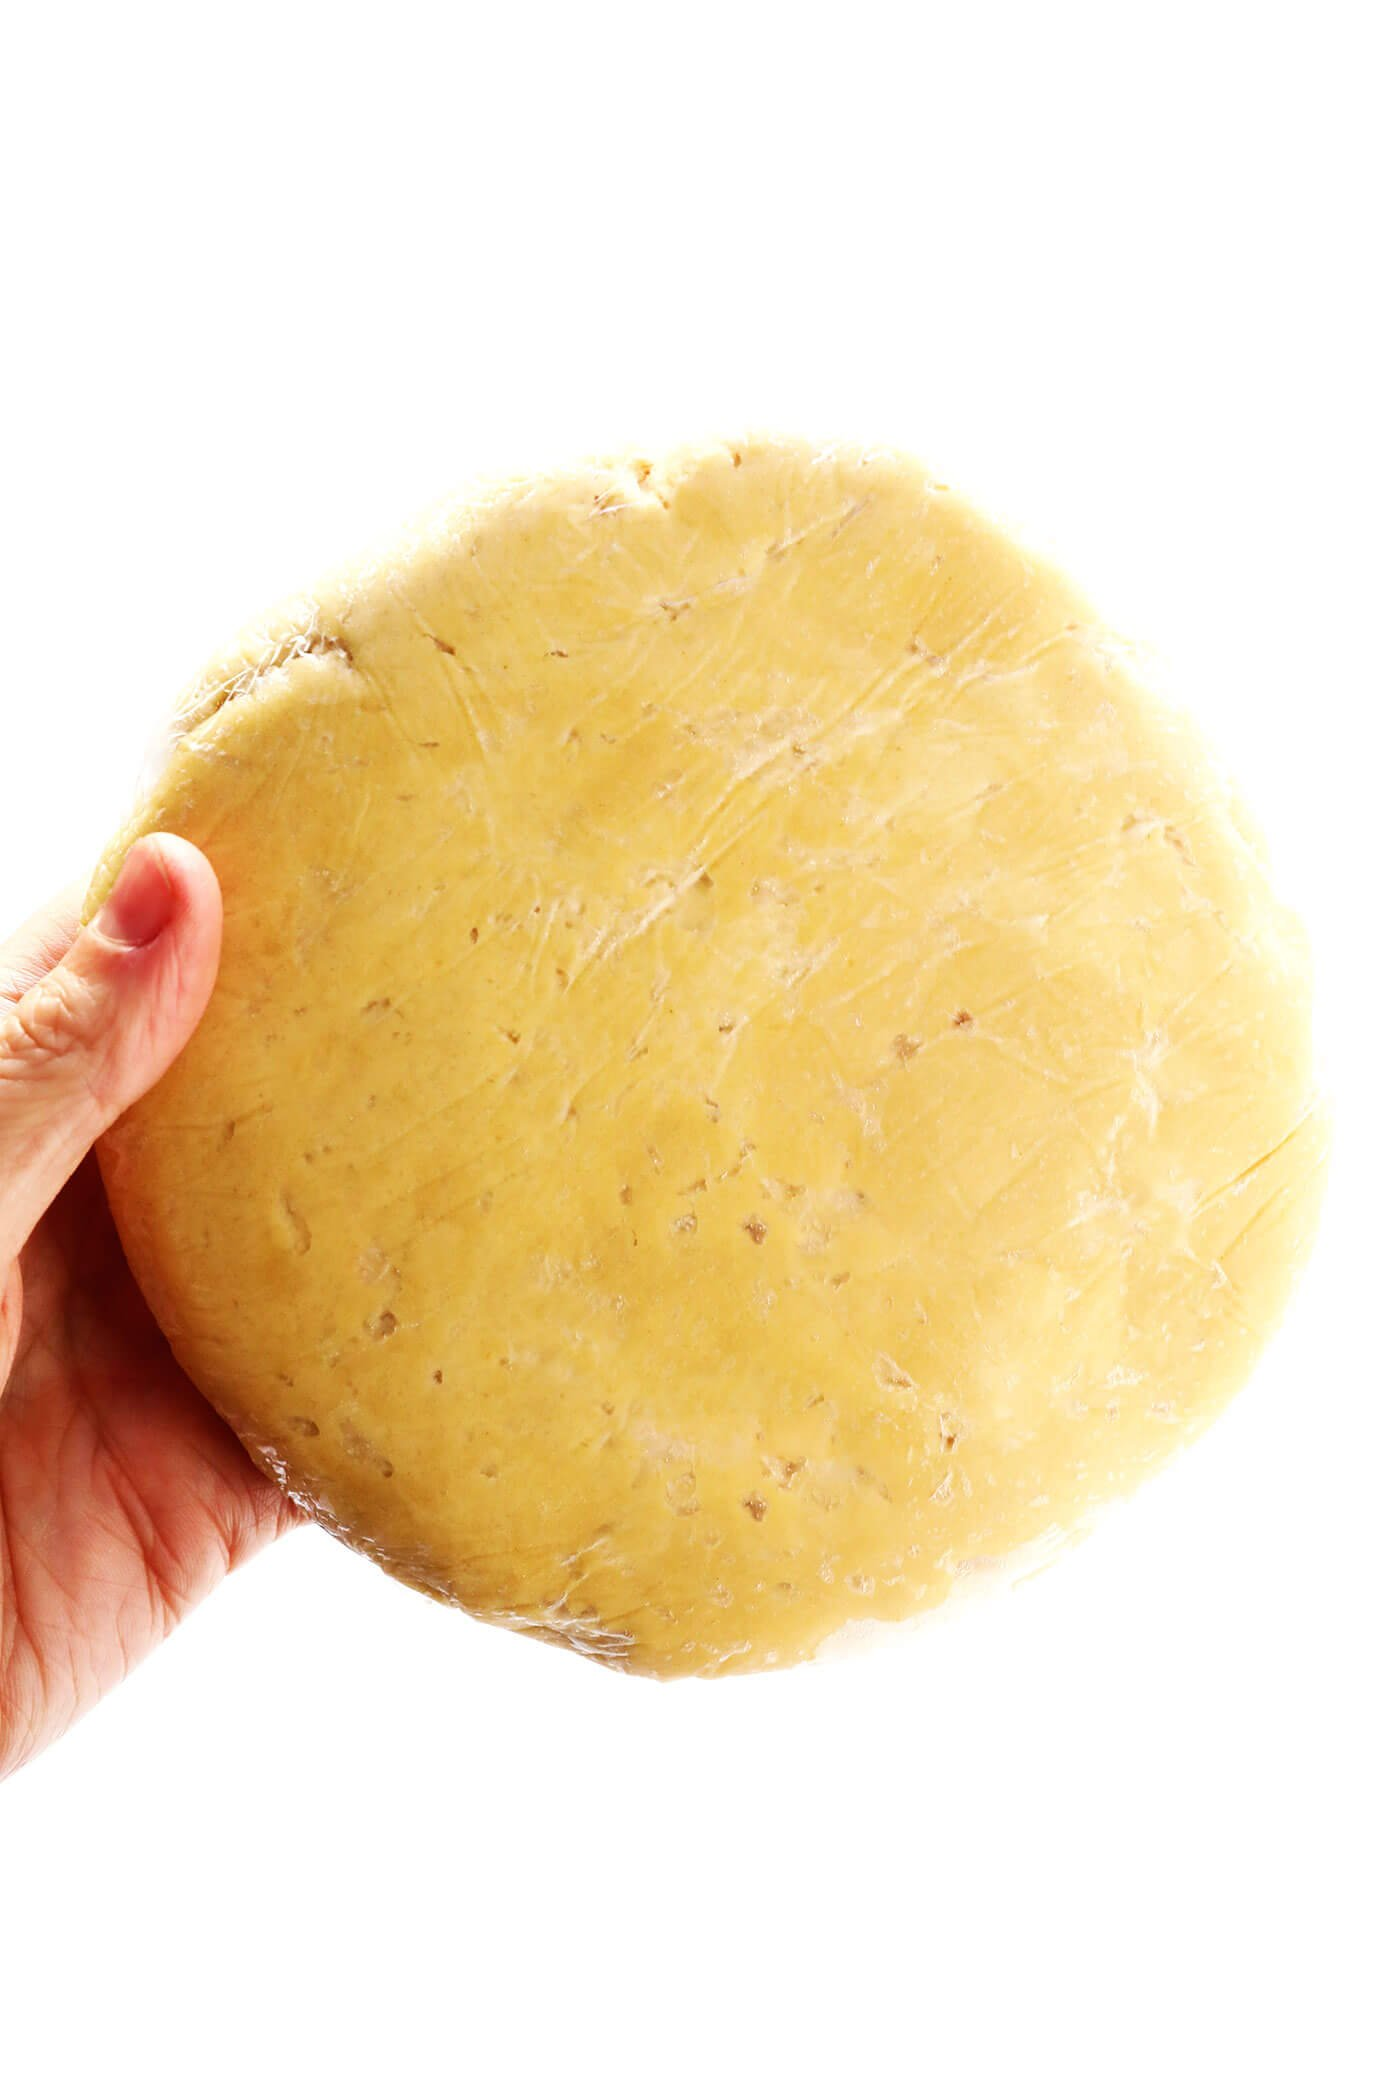 How To Freeze Sugar Cookie Dough Discs